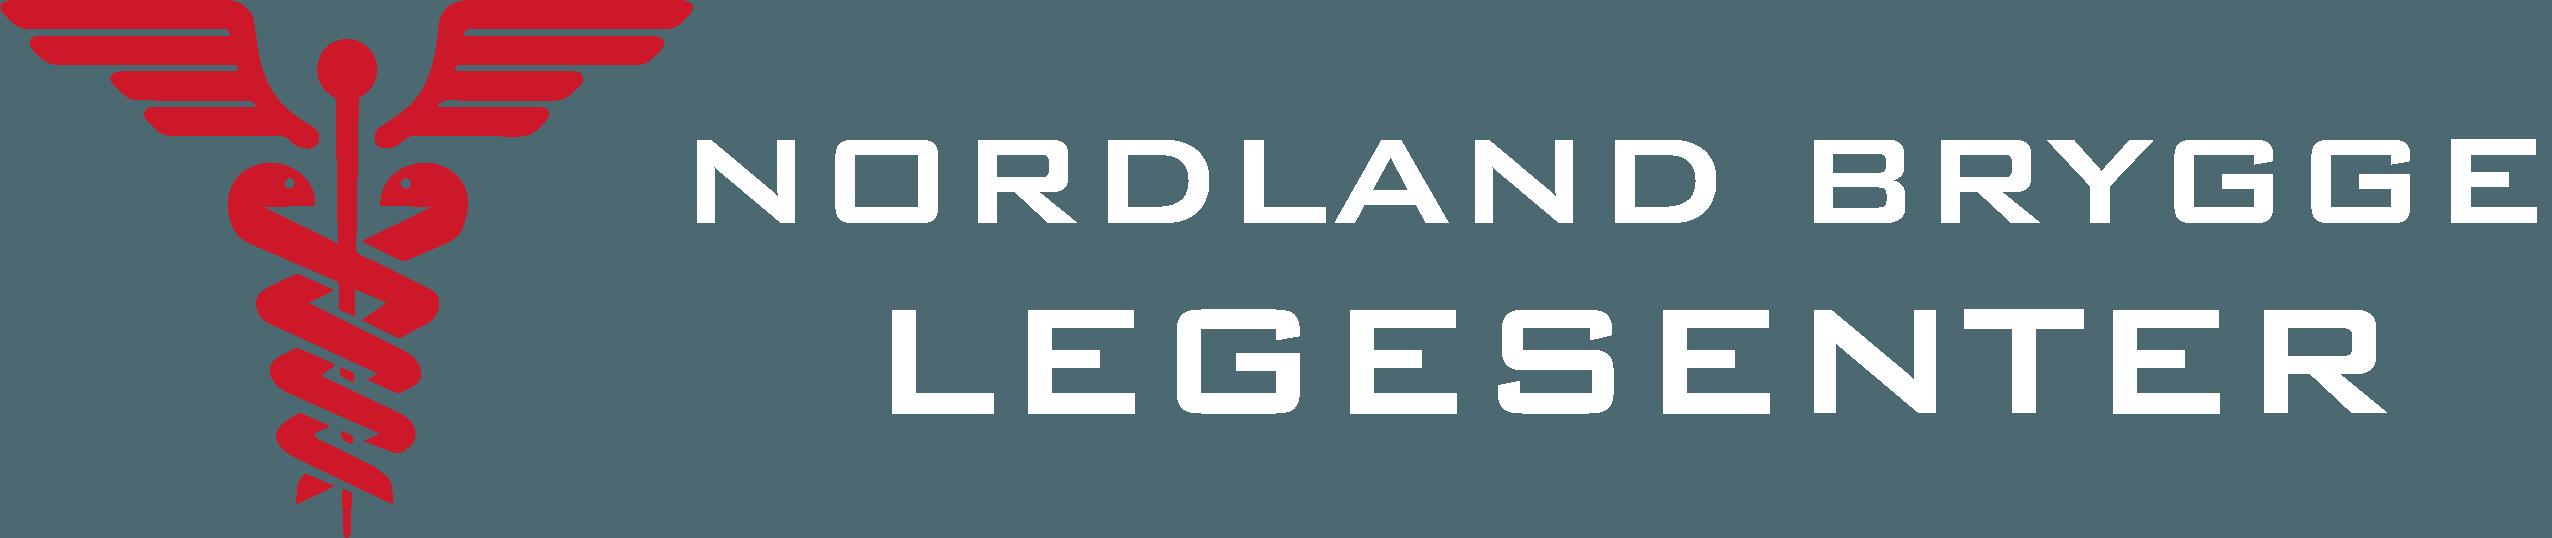 Nordland Brygge